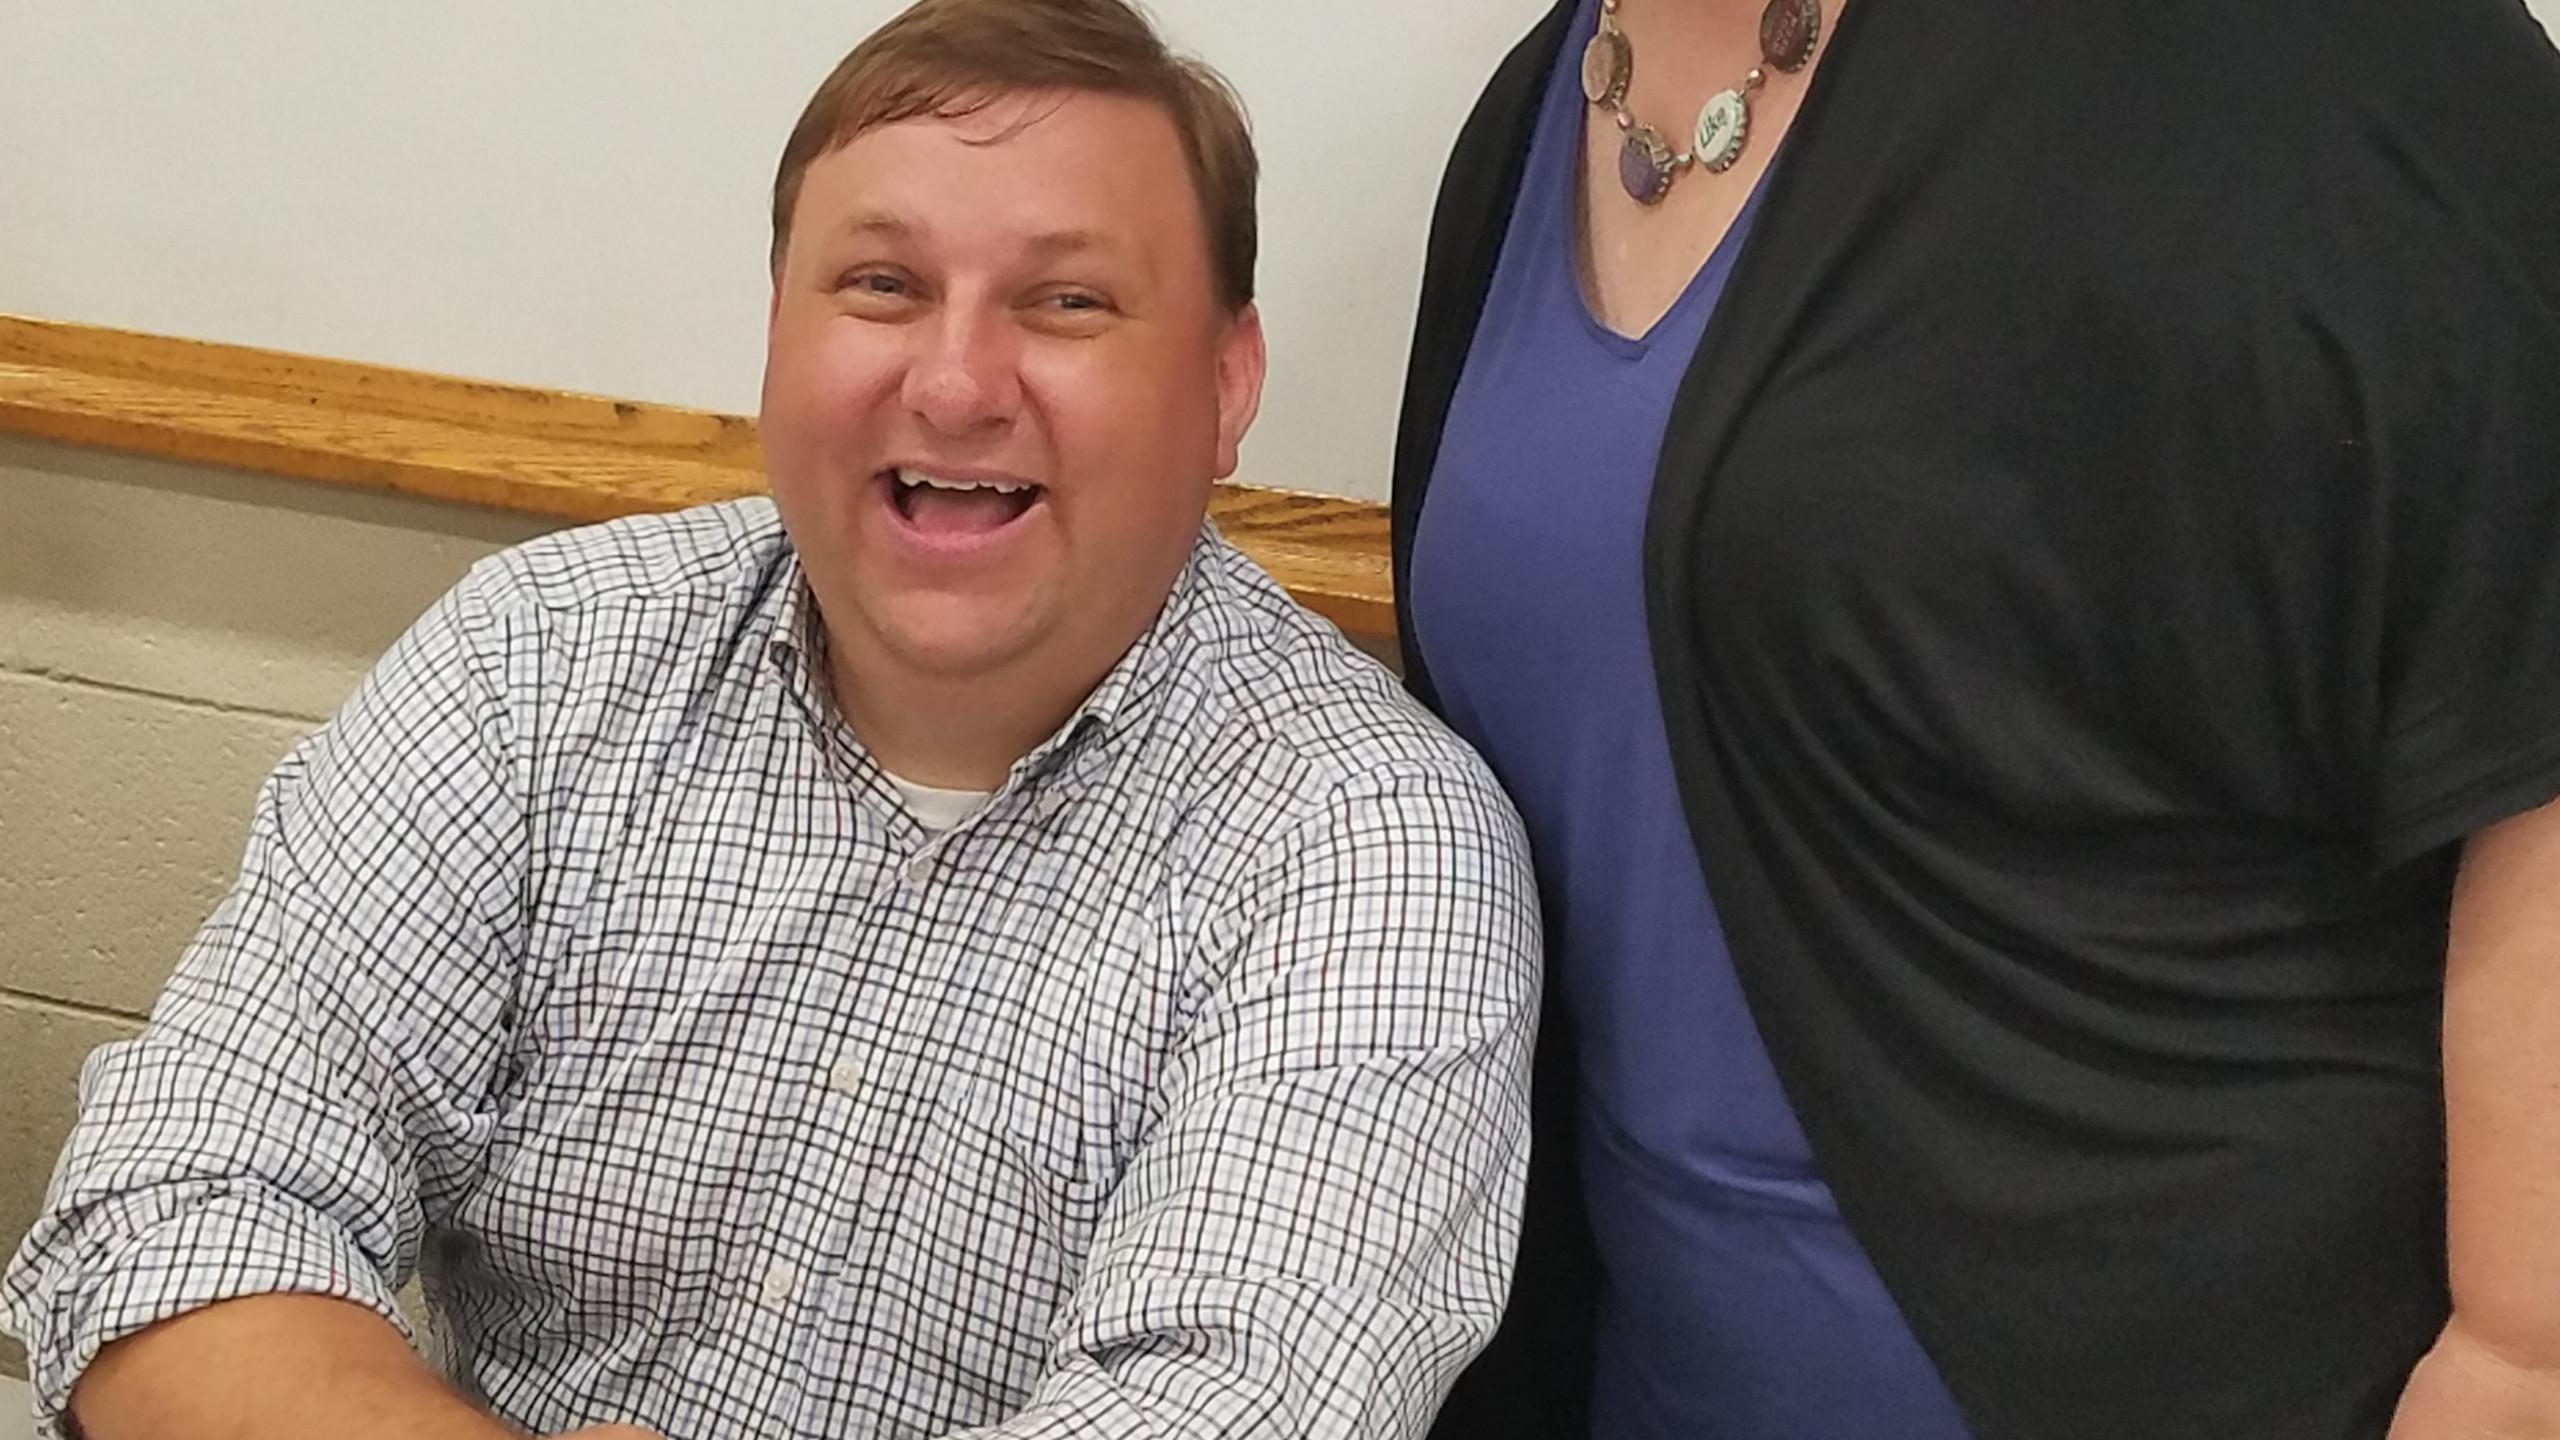 Aaron Marcavitch with Megan